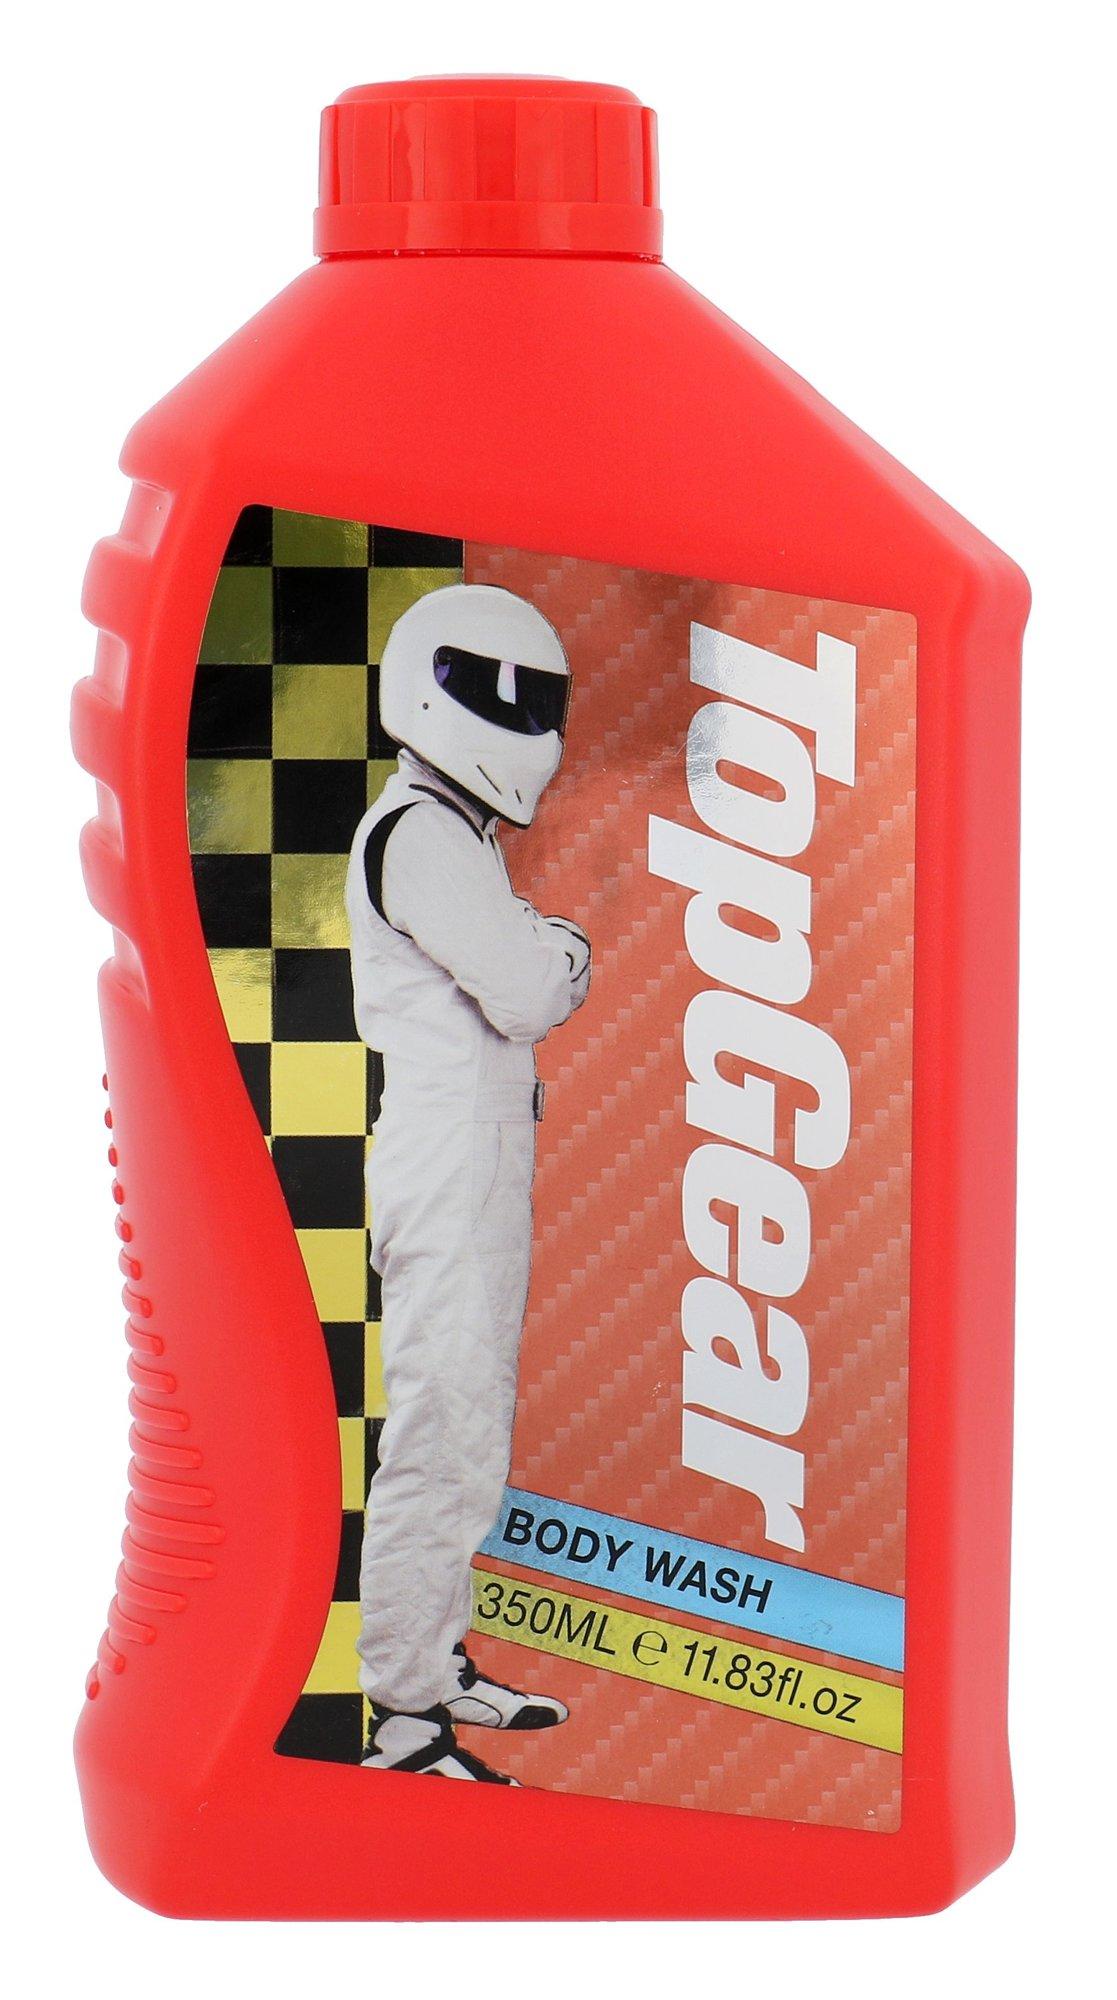 Top Gear Top Gear Red Shower gel 350ml